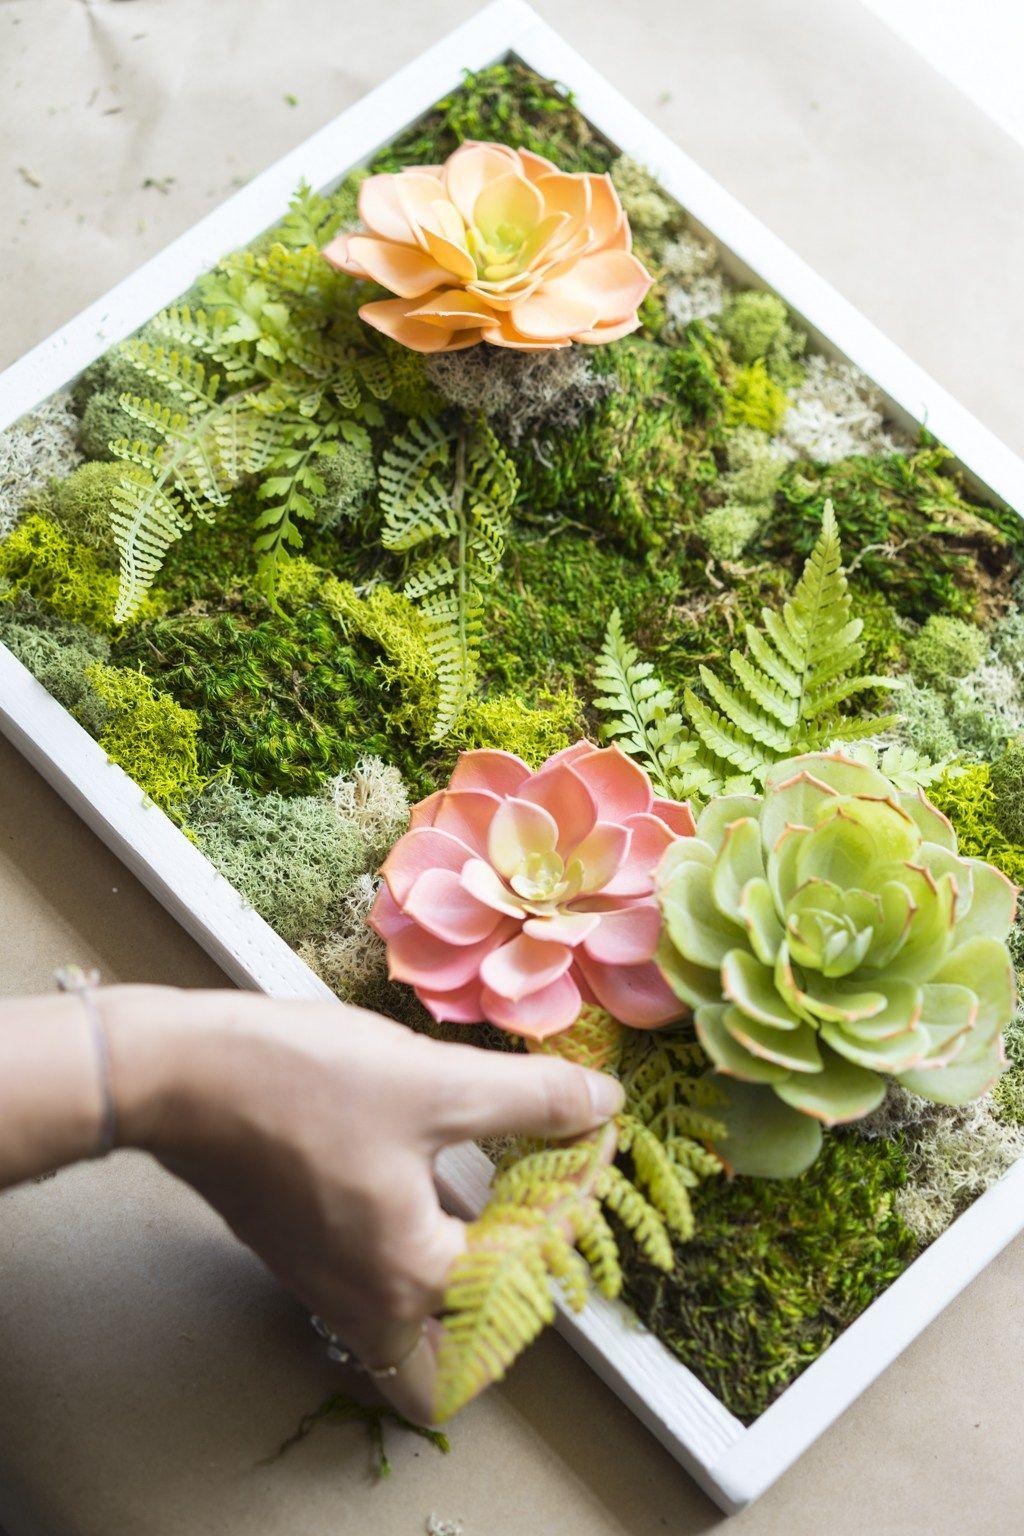 How to make a carefree moss garden dalla vita in 2020